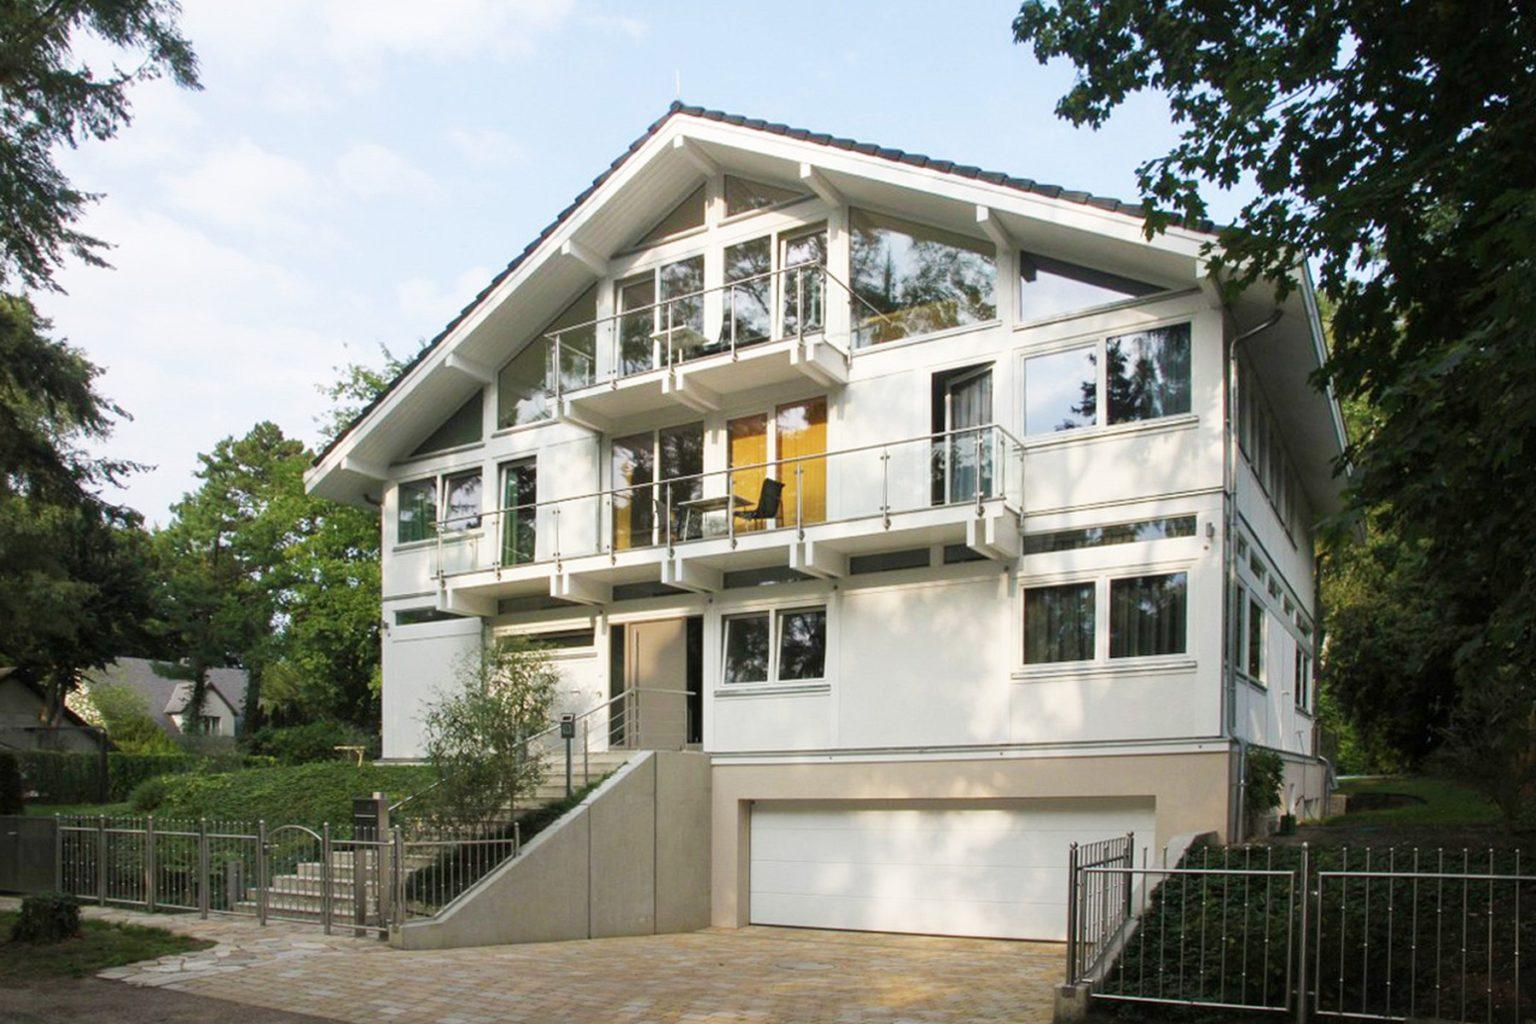 Modernes Fachwerkhaus Architektenhaus Hell Holz Skelett Konstruktion 14